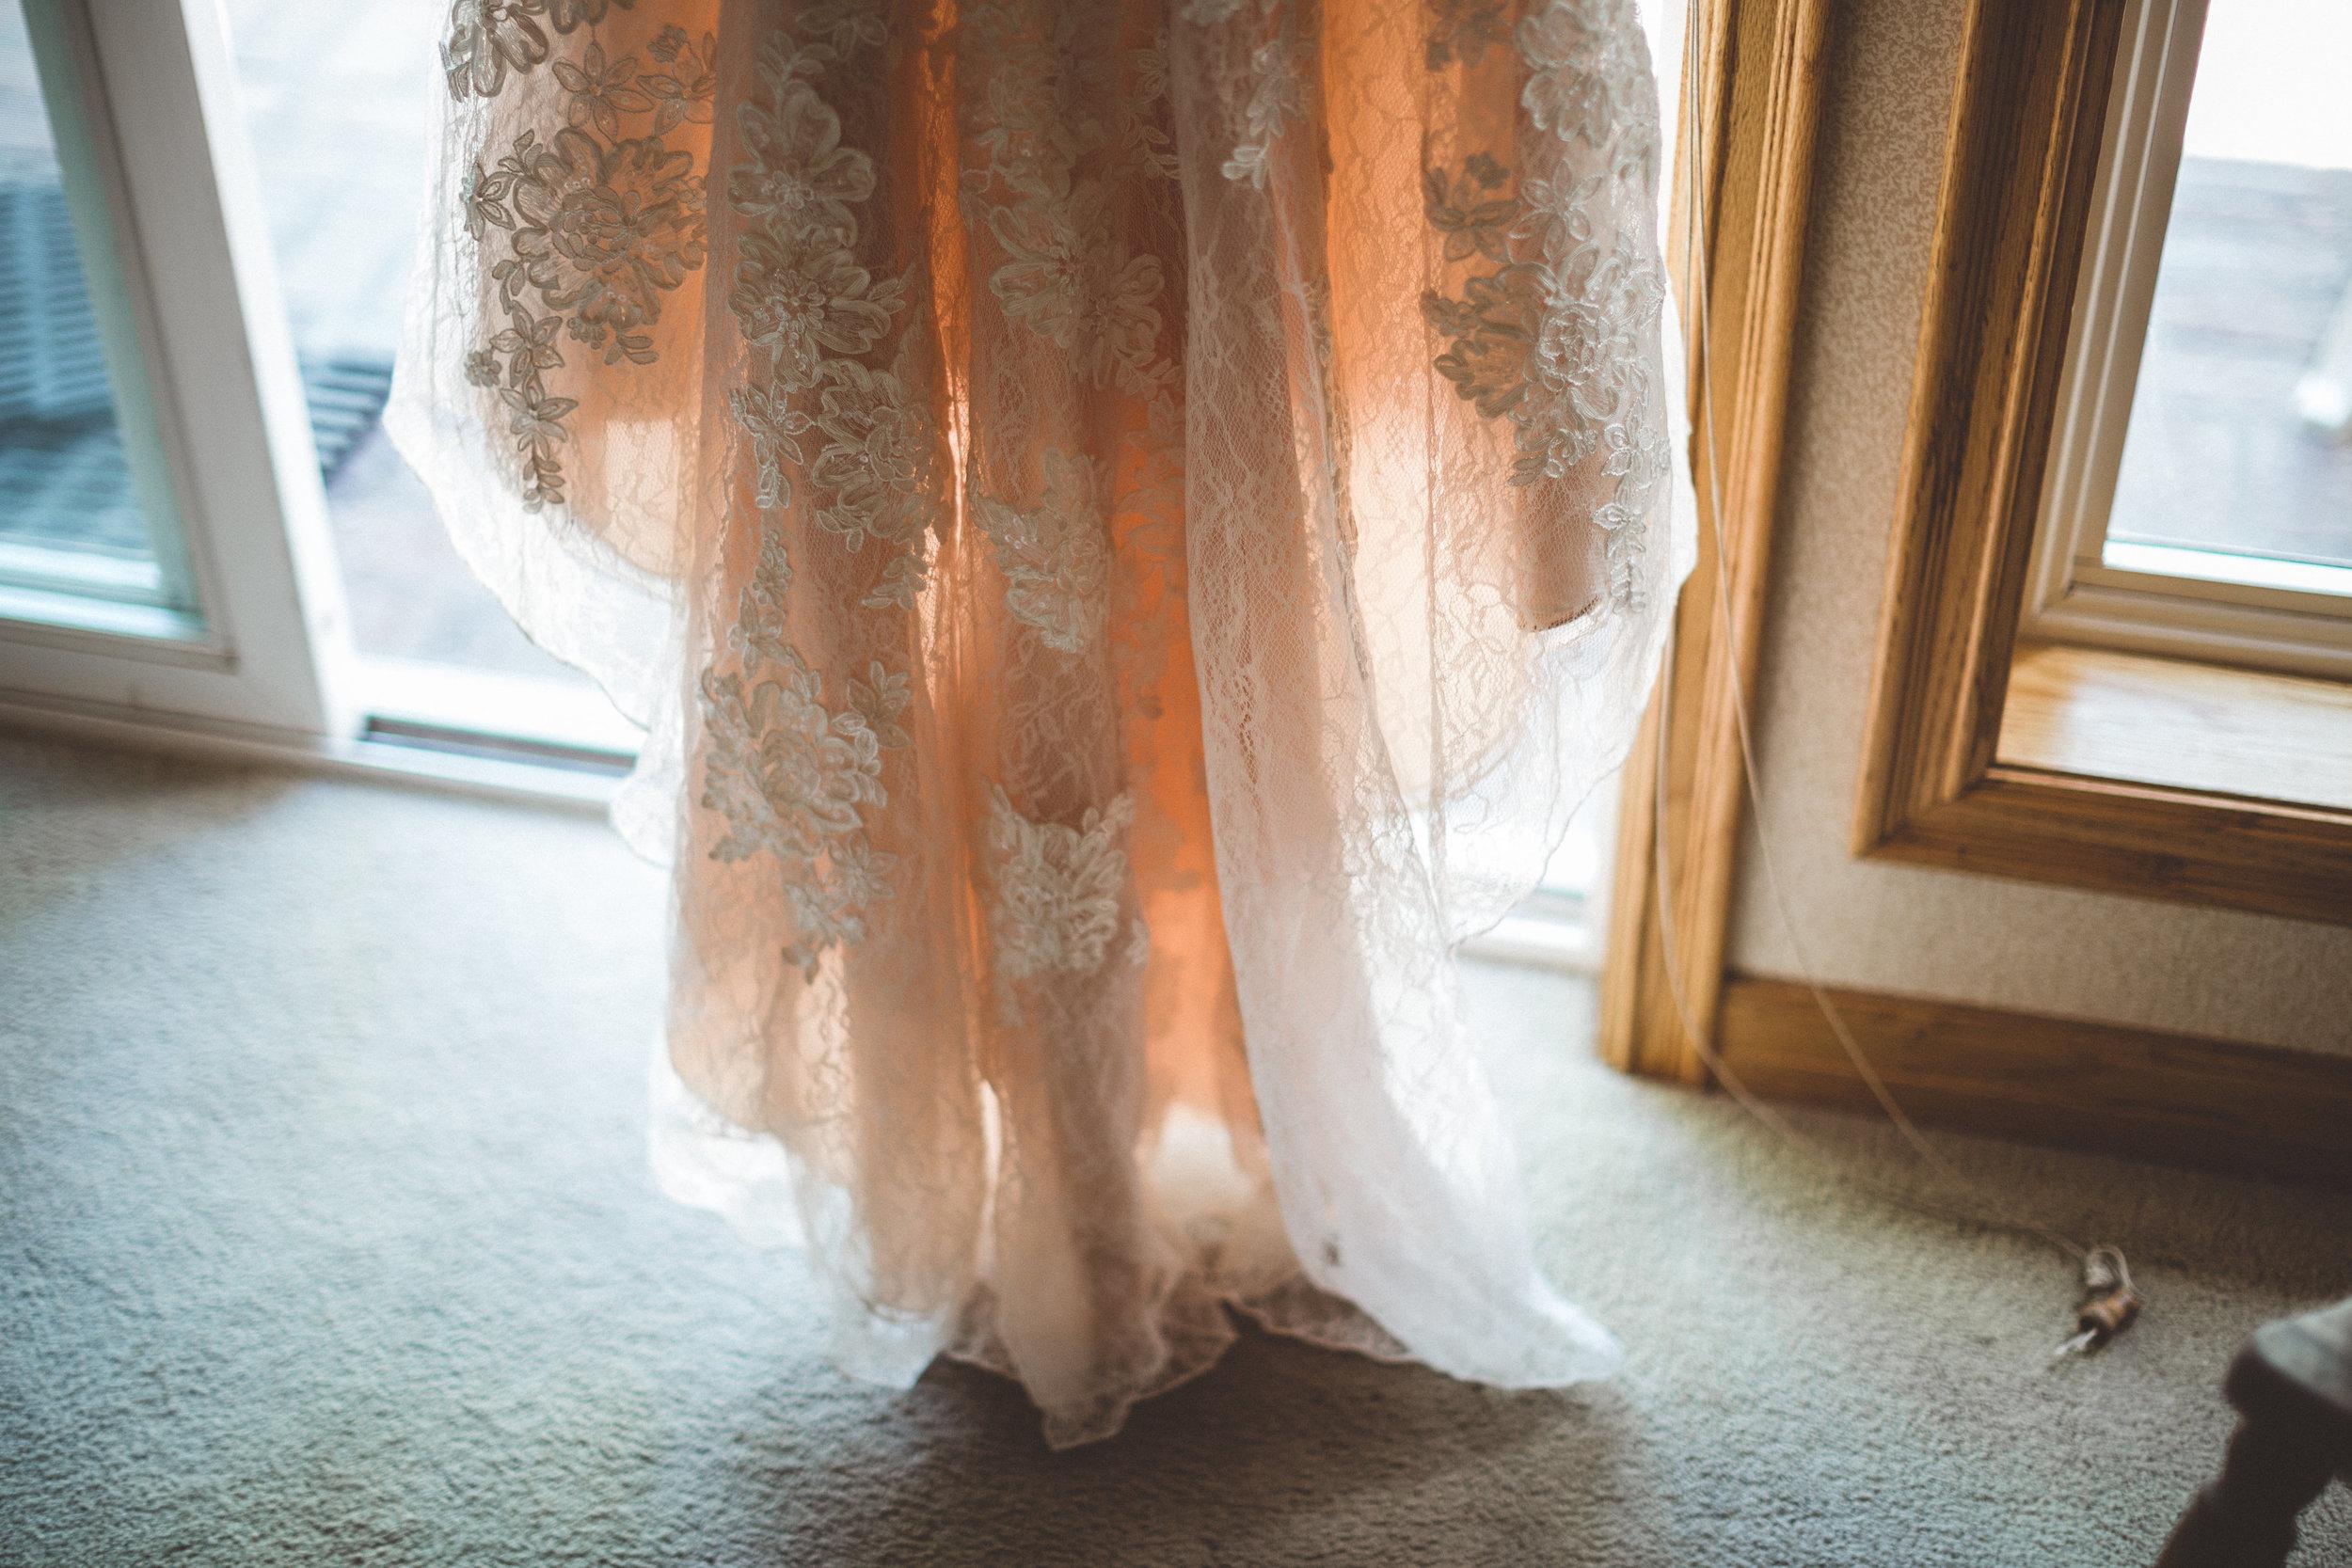 jill-and-alexs-intimates-big-bear-wedding2.jpg